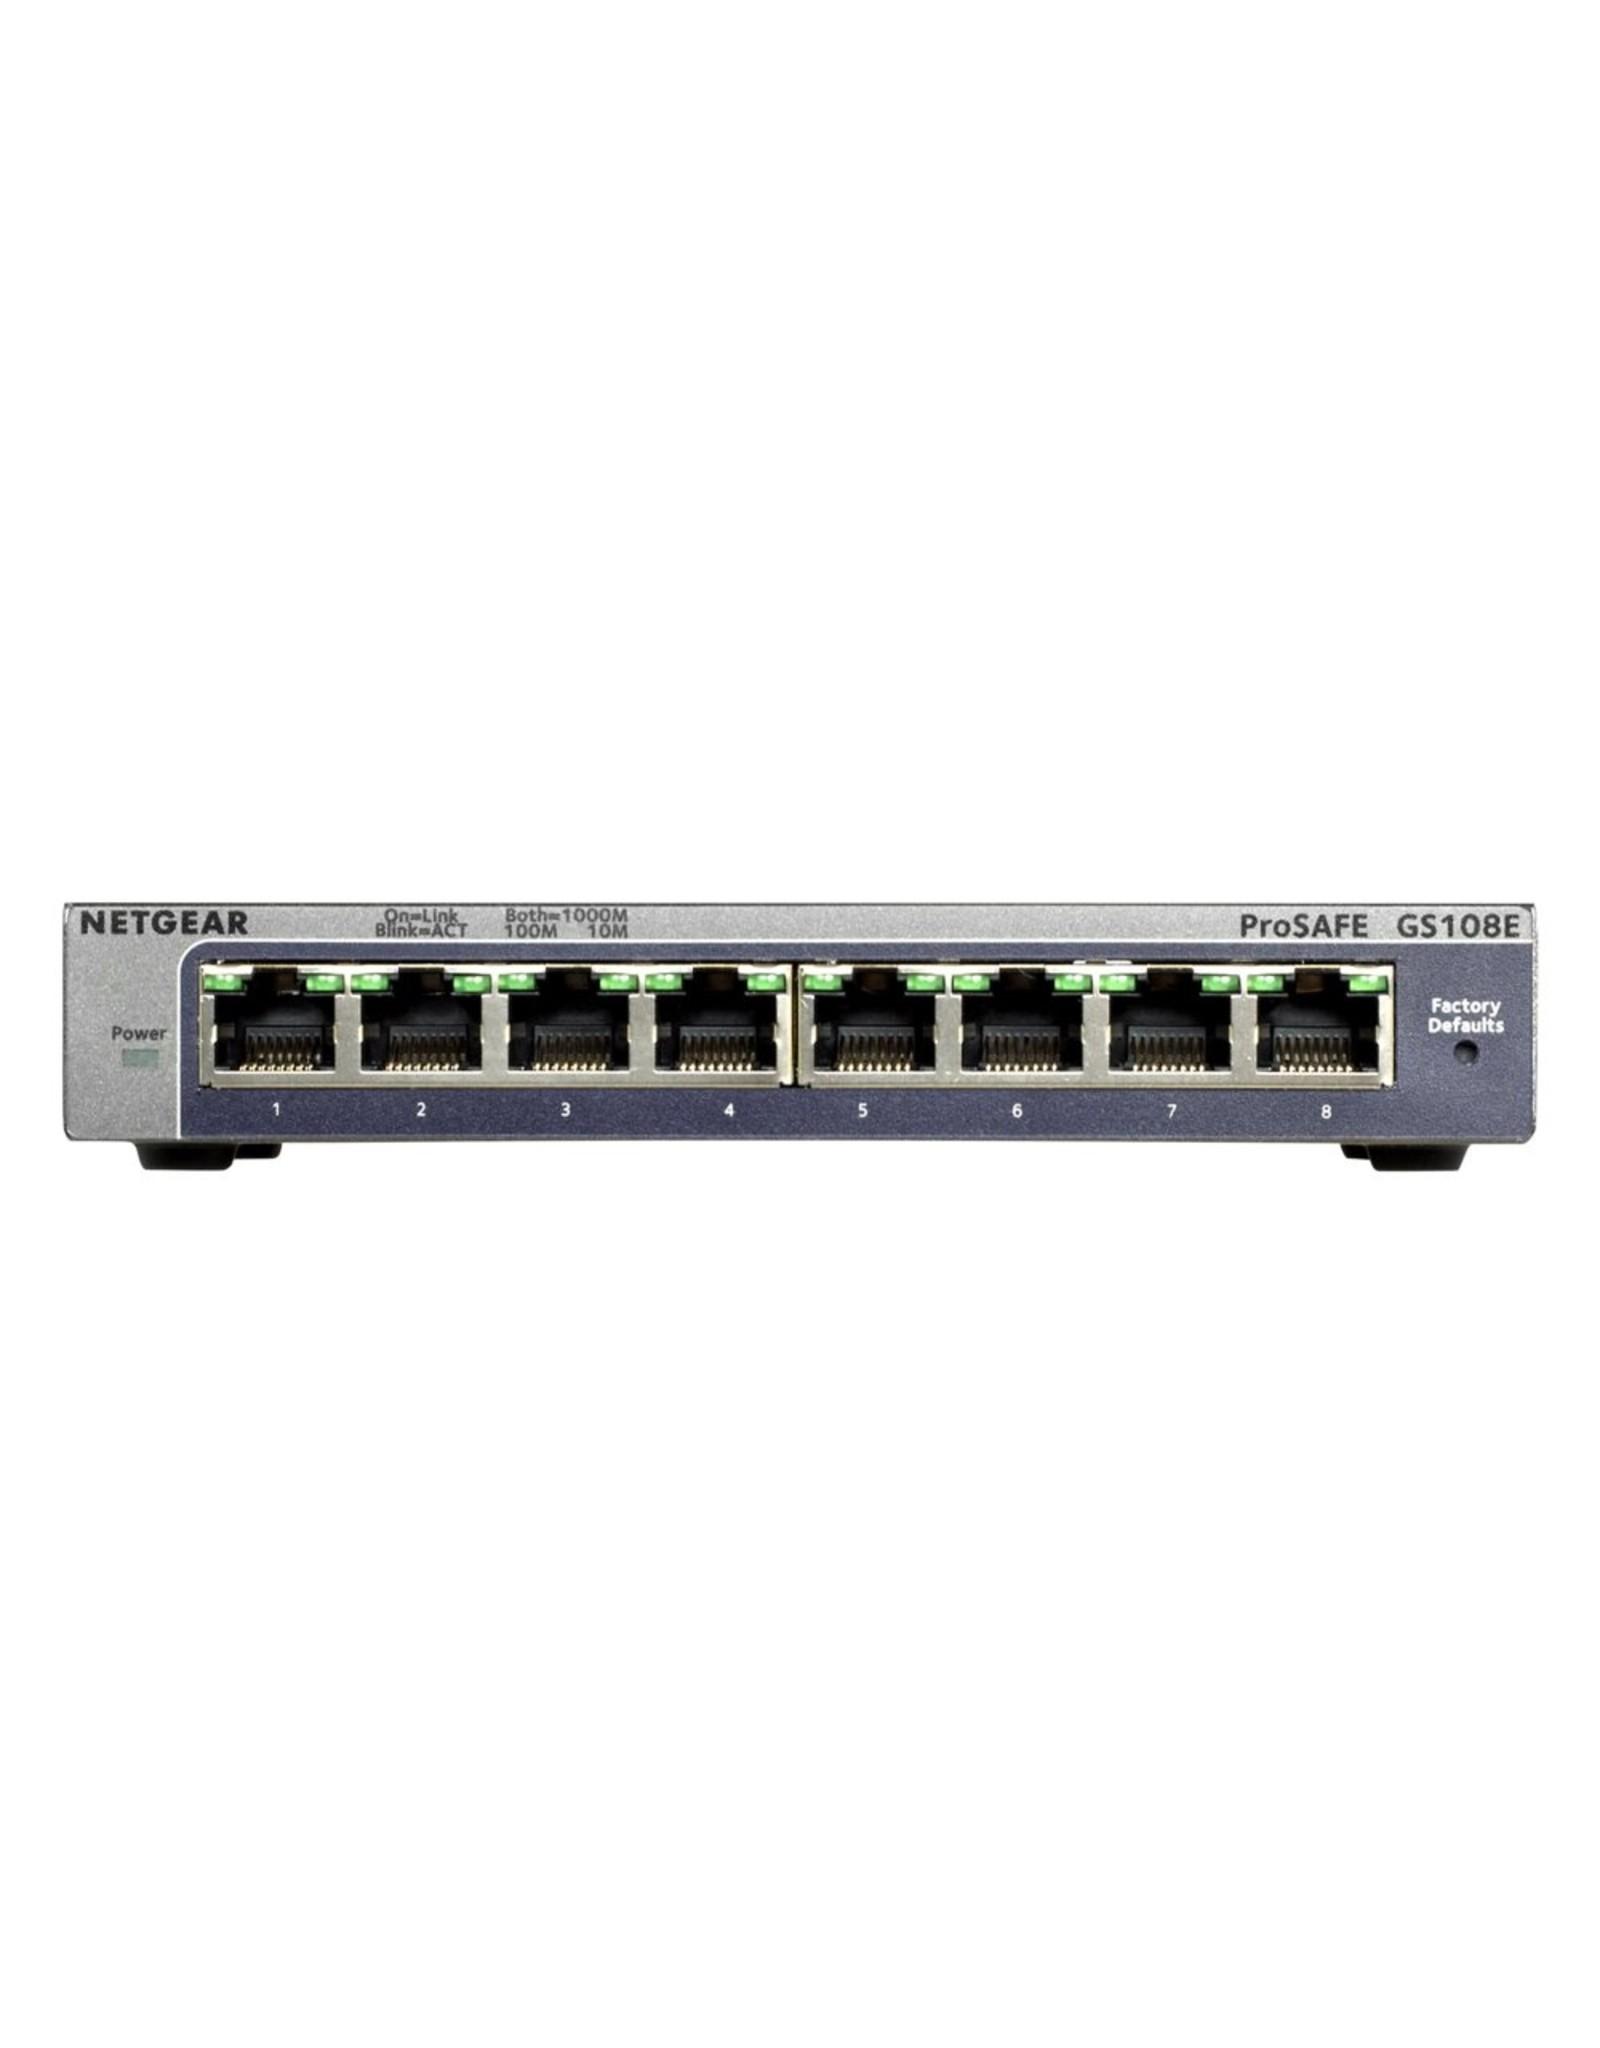 Netgear Prosafe Gigabit Plus Switch GS108Ev3